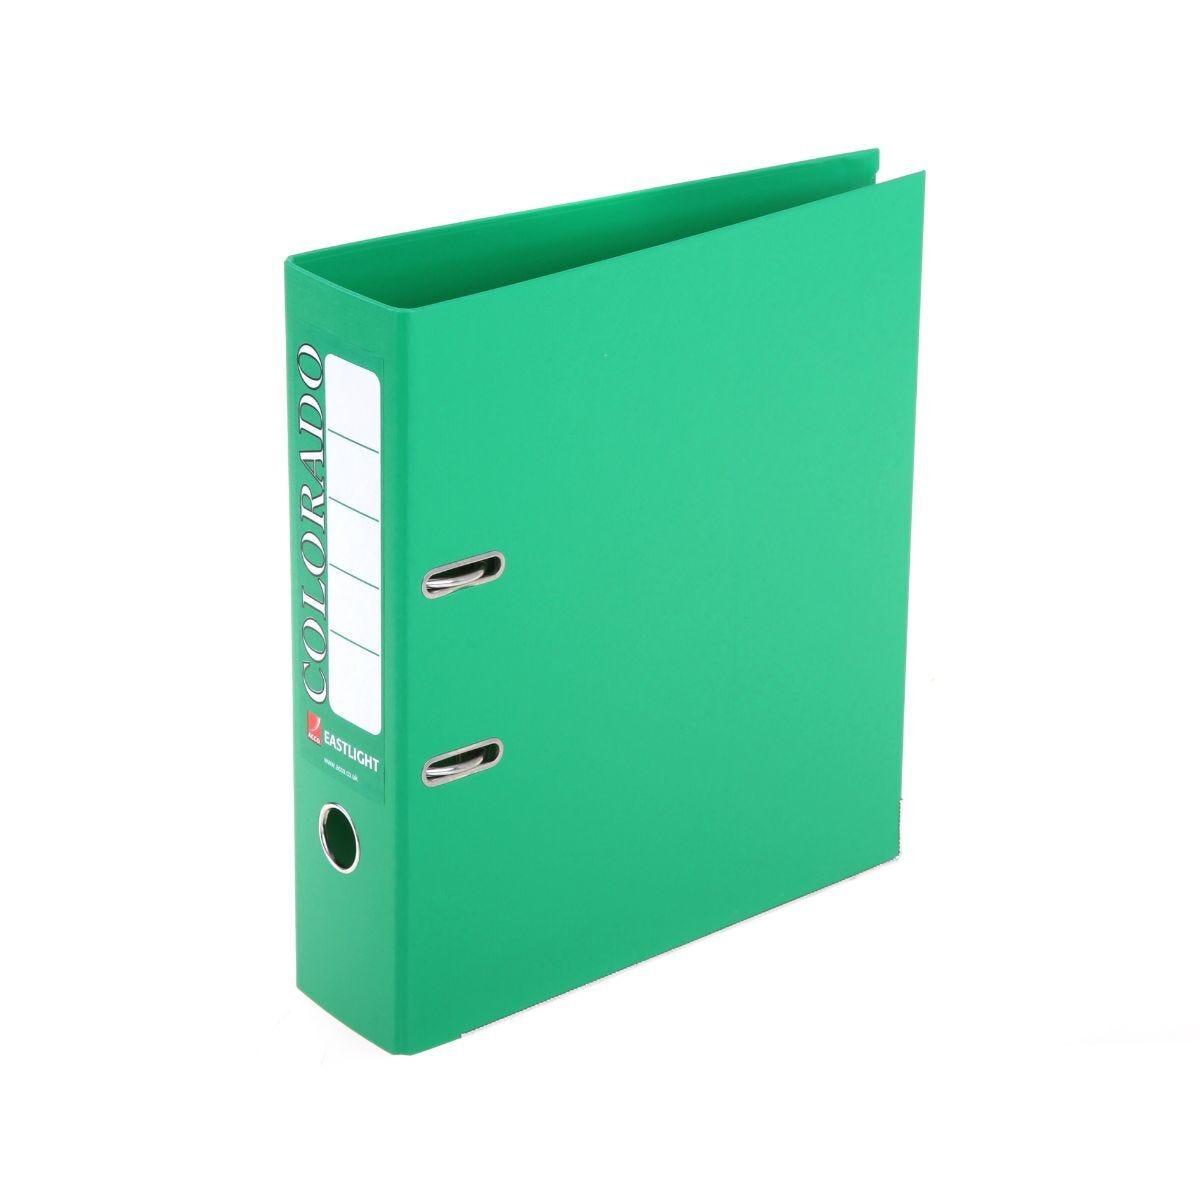 Colorado Lever Arch Spine File A4 Green